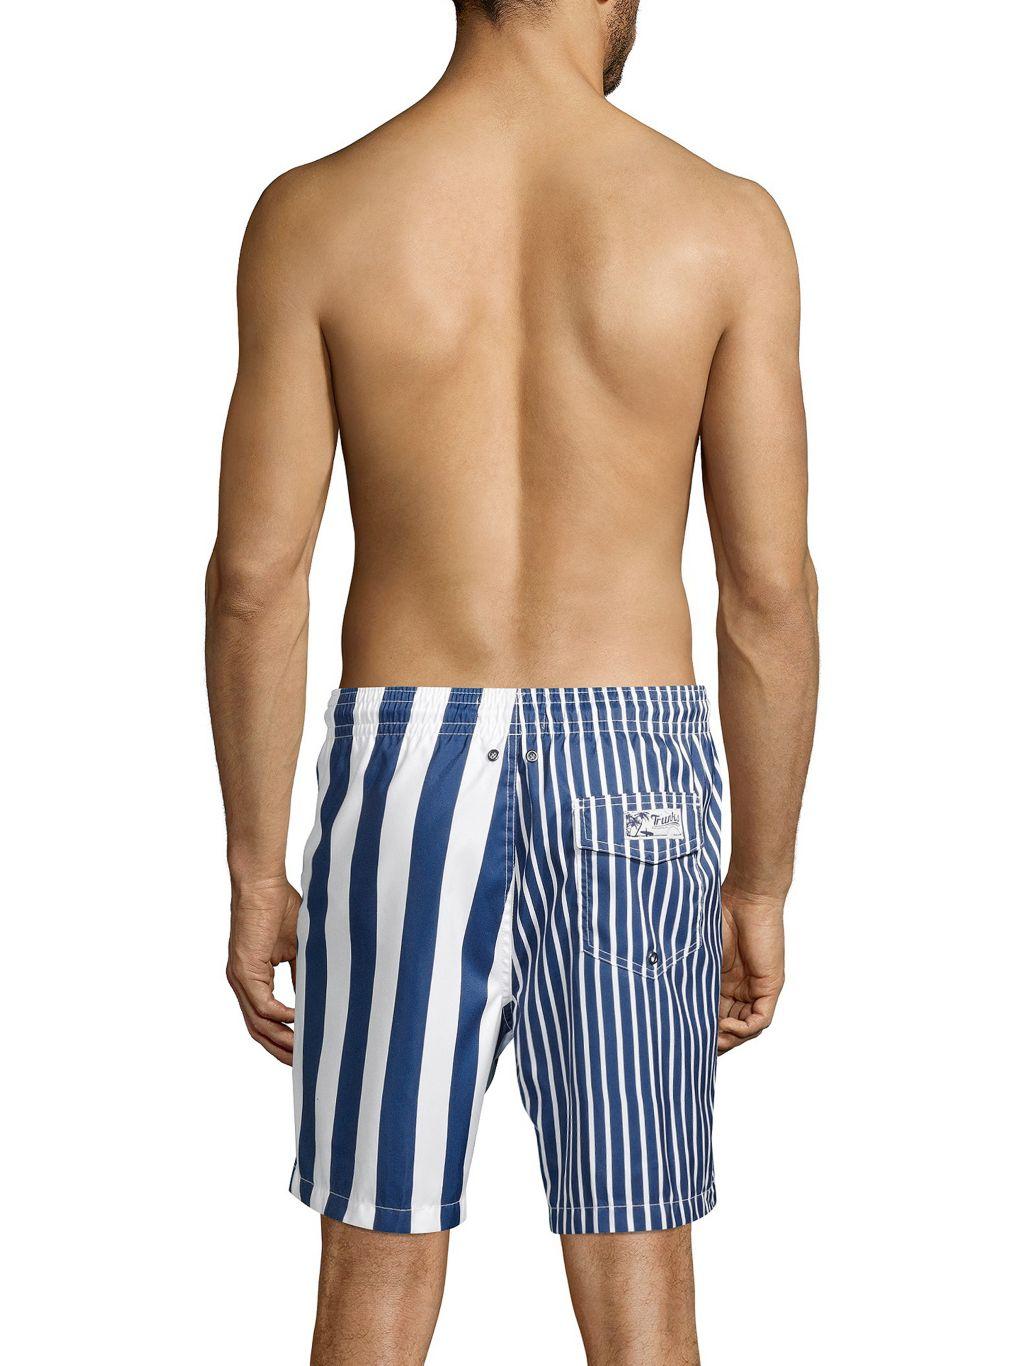 Trunks Surf + Swim Striped Swim Shorts